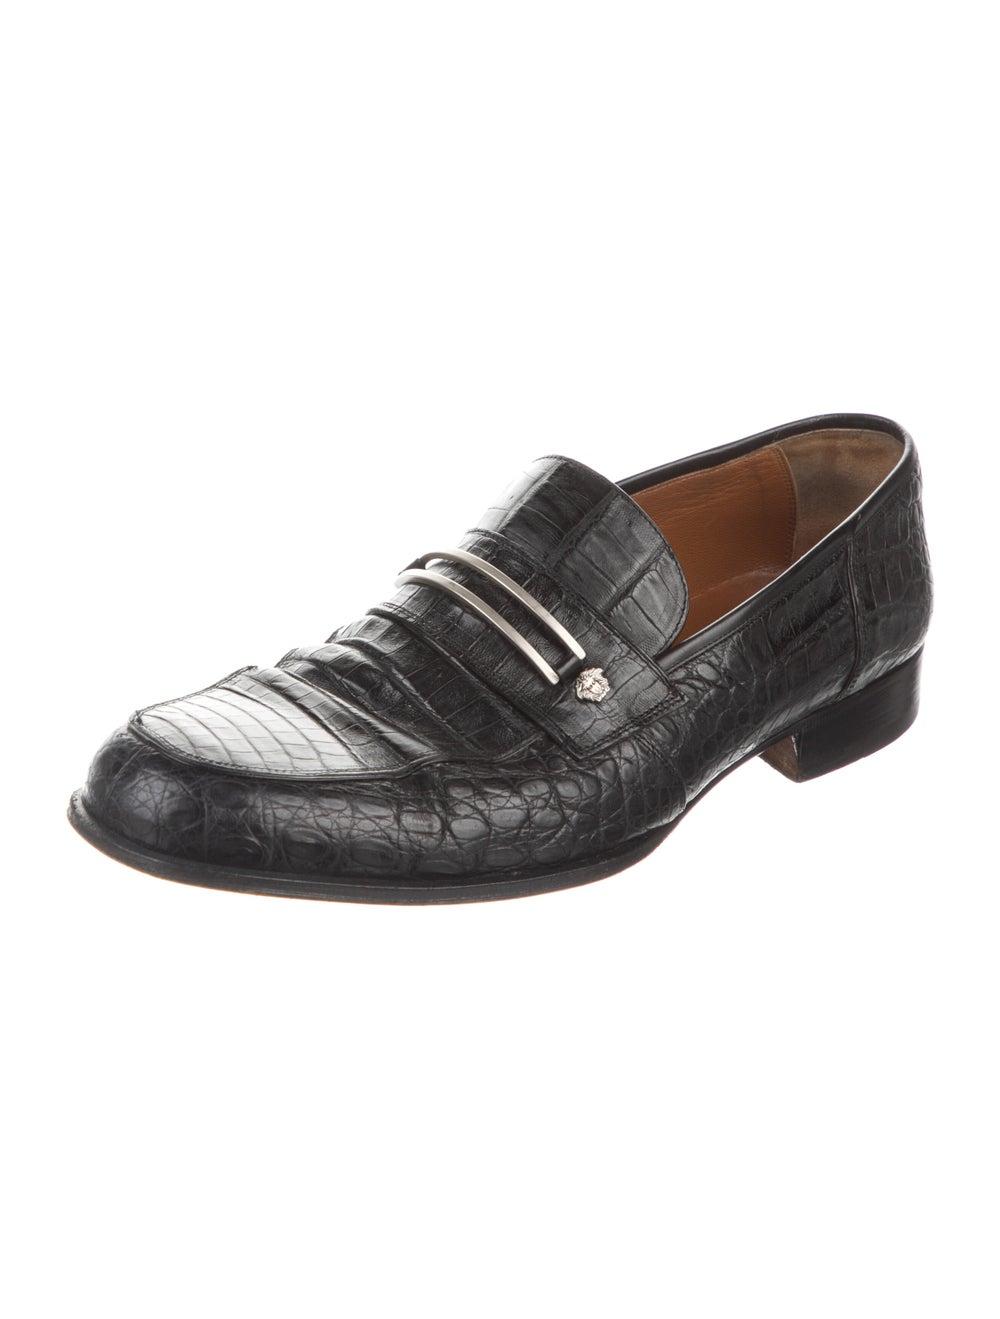 Gianni Versace Alligator Dress Loafers Black - image 2